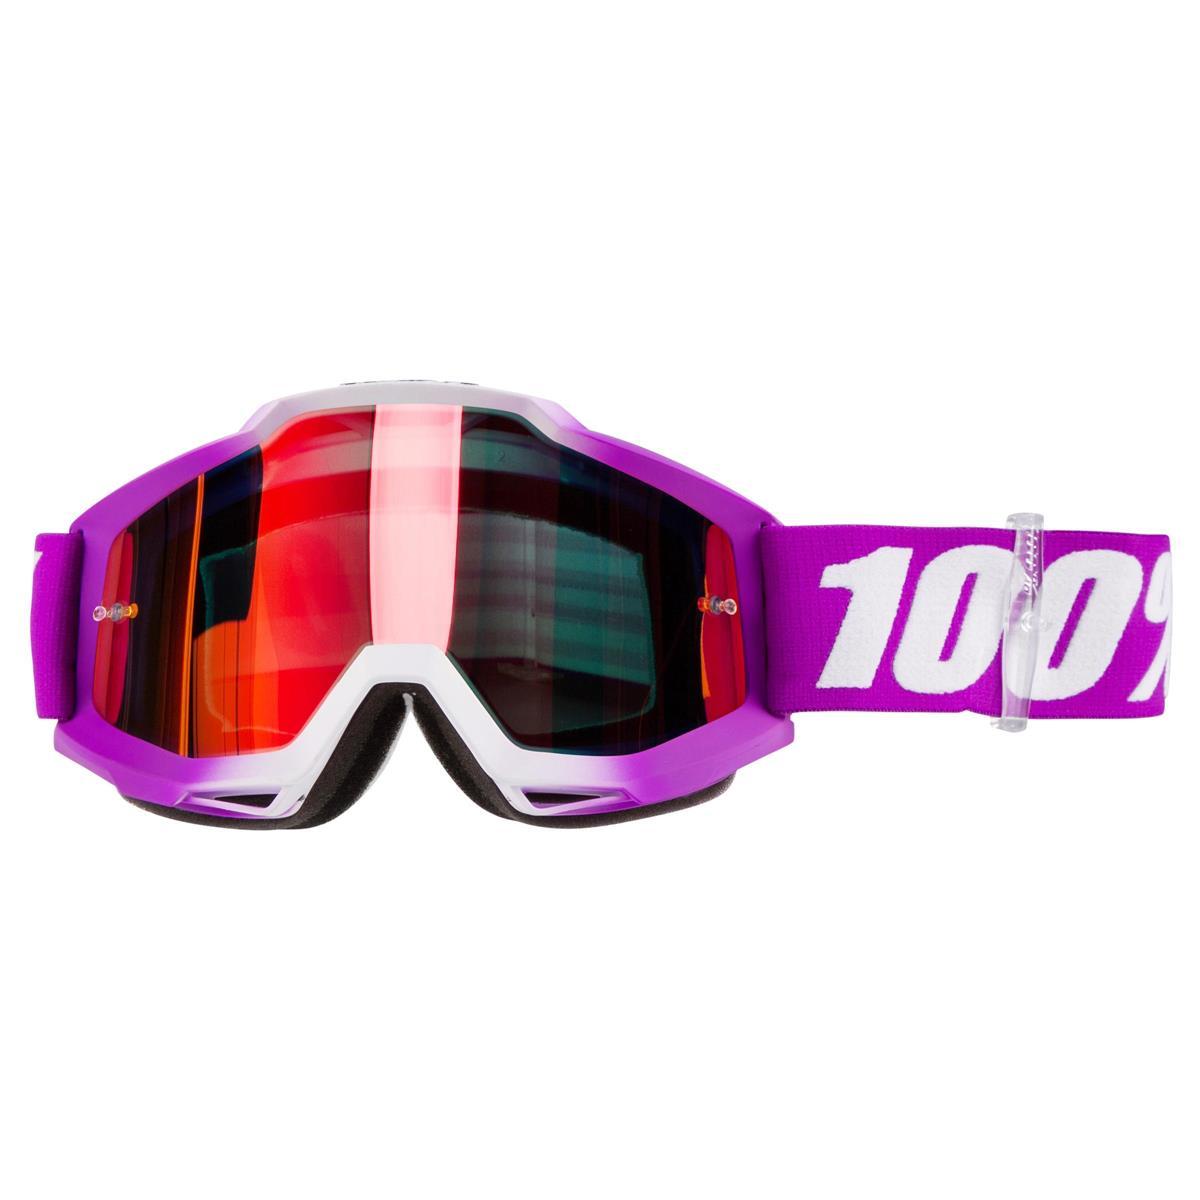 4edec265cc4a 100% Goggle The Accuri Framboise - Mirror Red Anti-Fog 2019